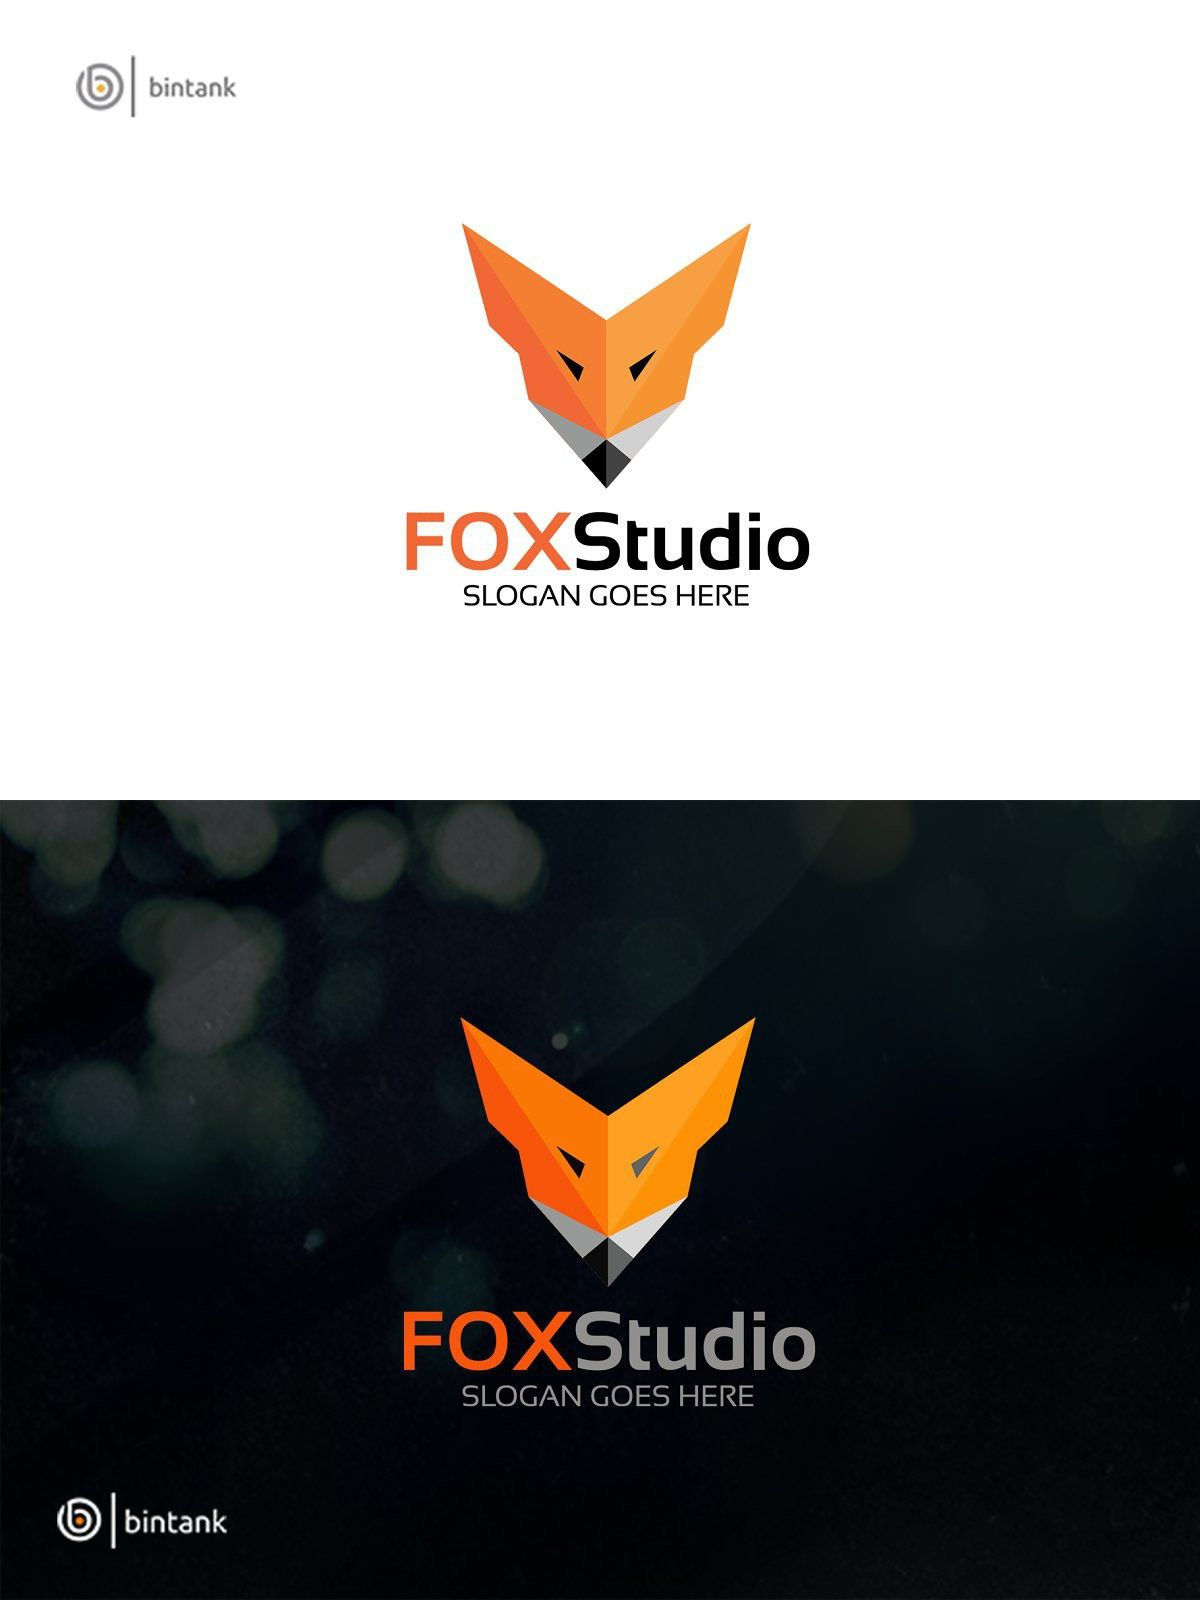 Fox Studio Fox Logo Fox Logo Fox Studios Adobe Illustrator Software